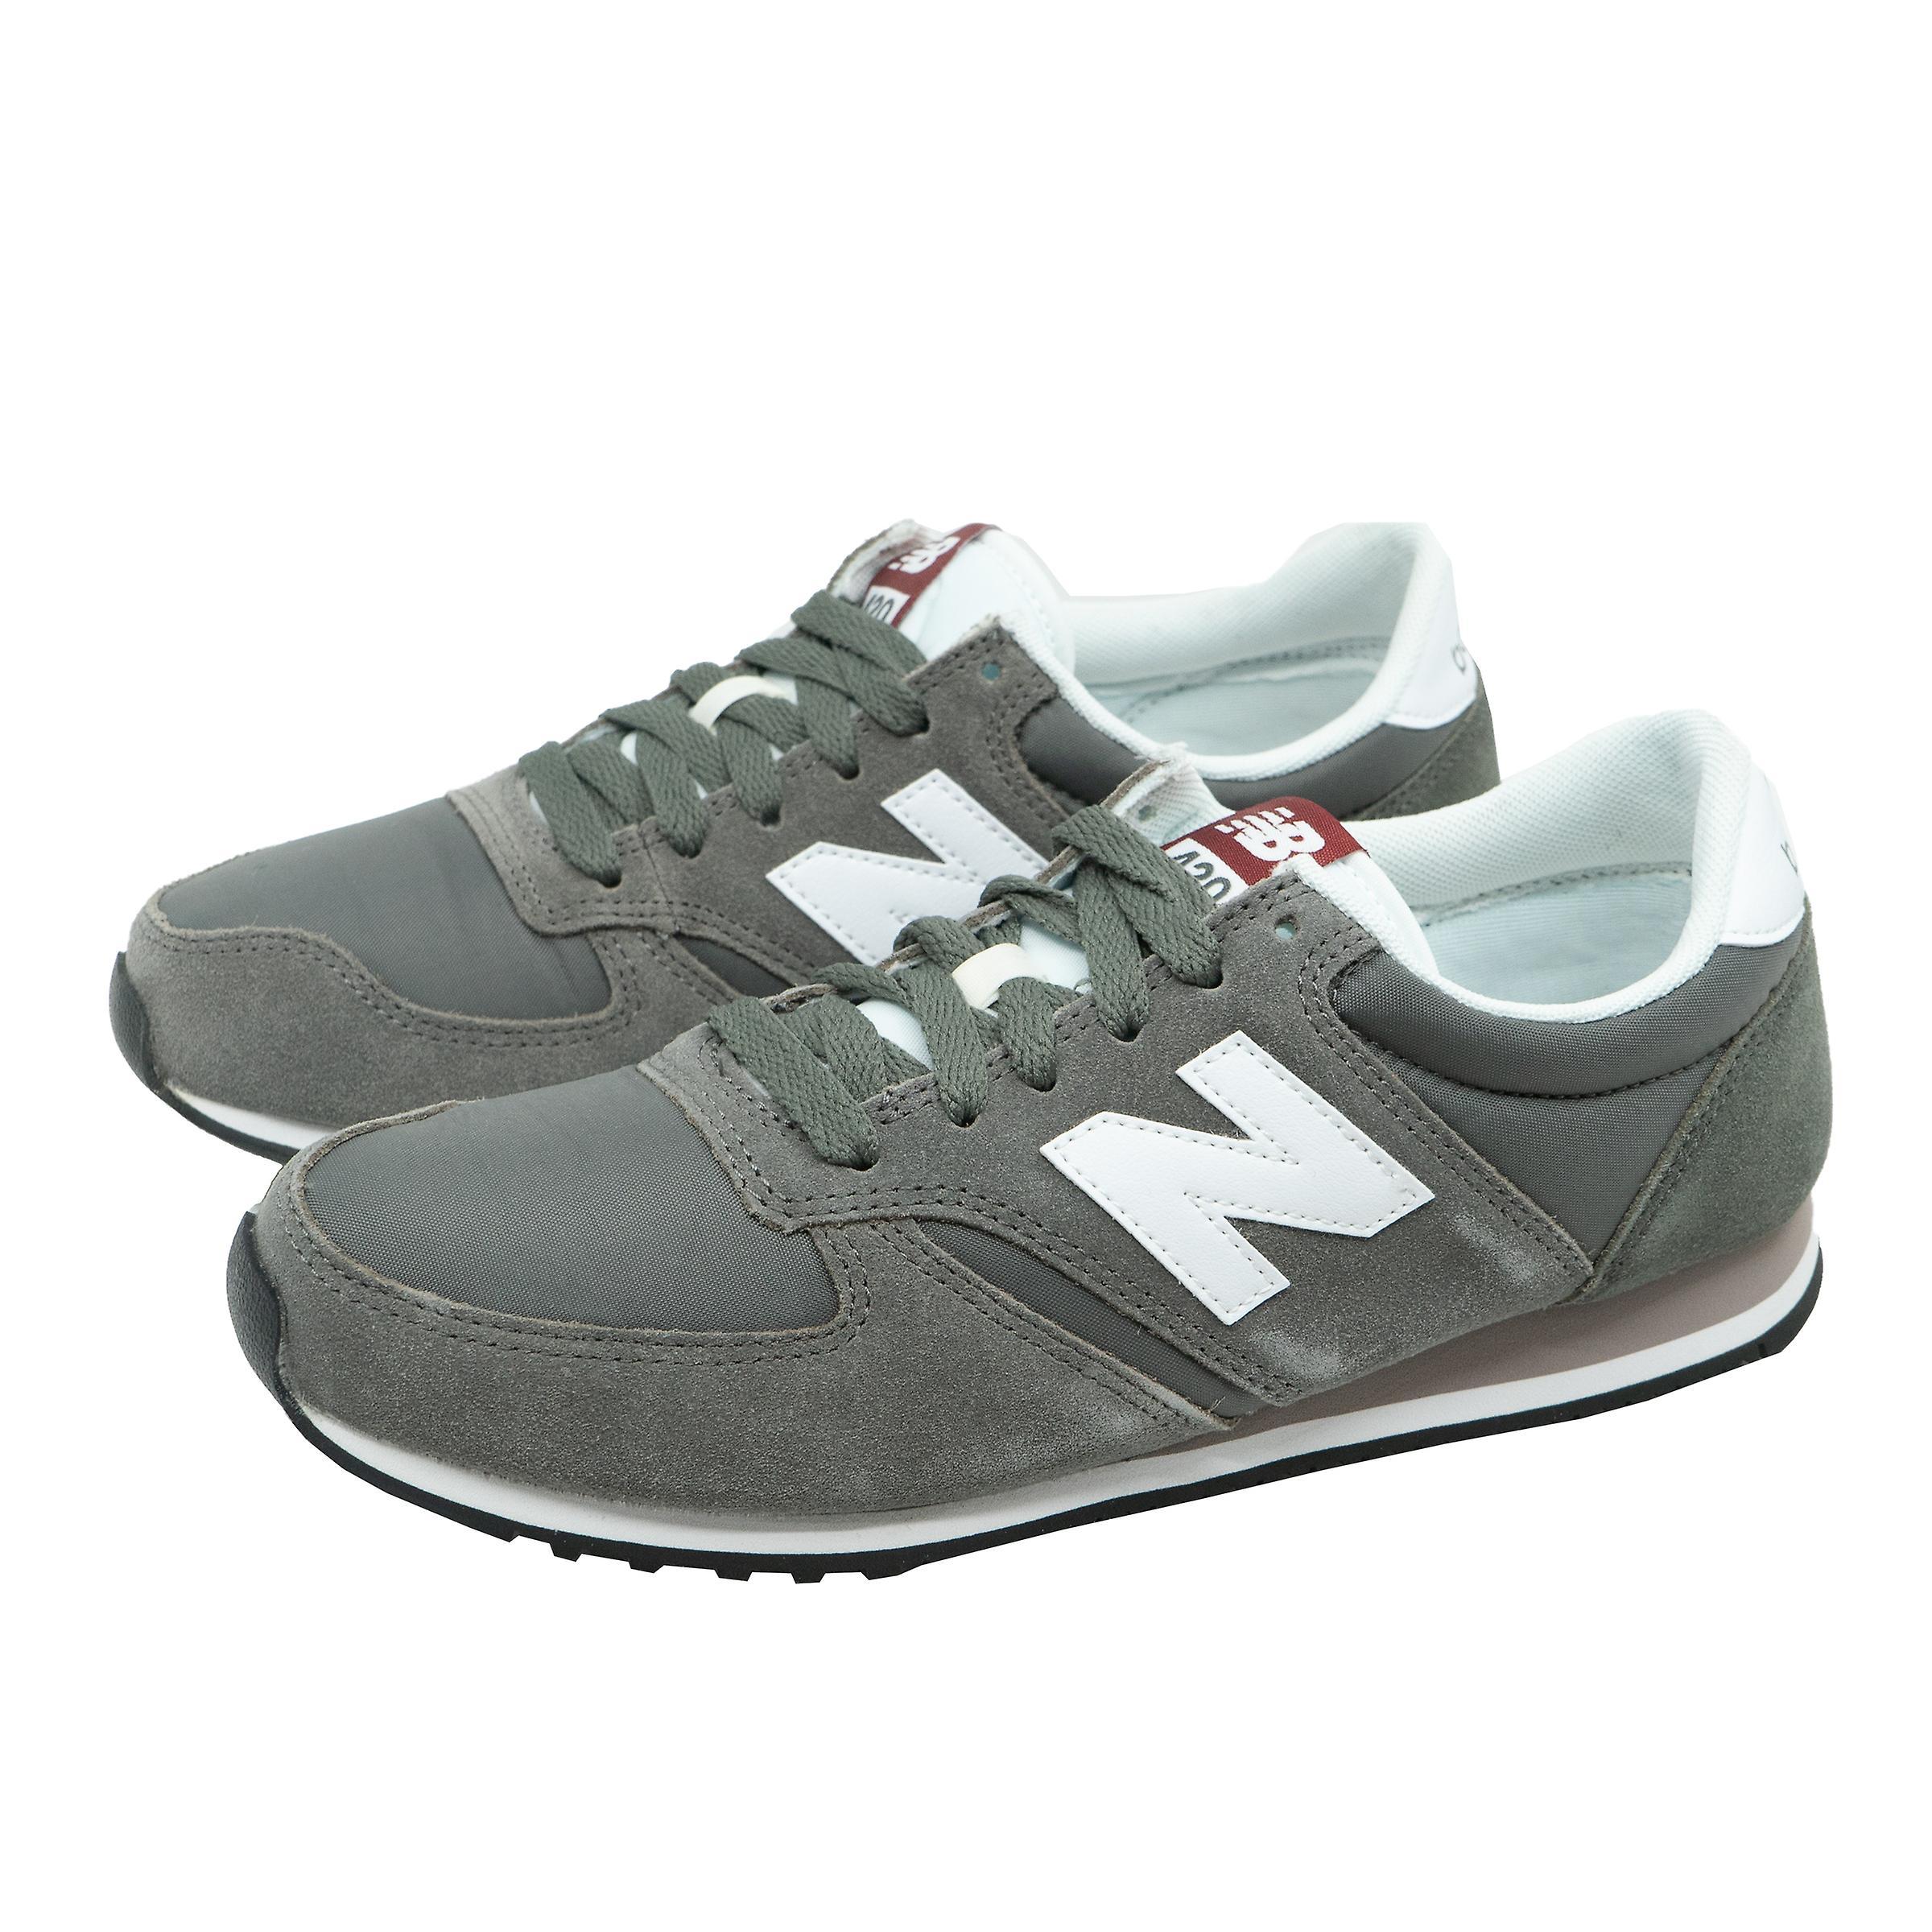 36fcfdc5409fc New balance U 420 women's / unisex sneakers running shoes grey wild leather  40-42